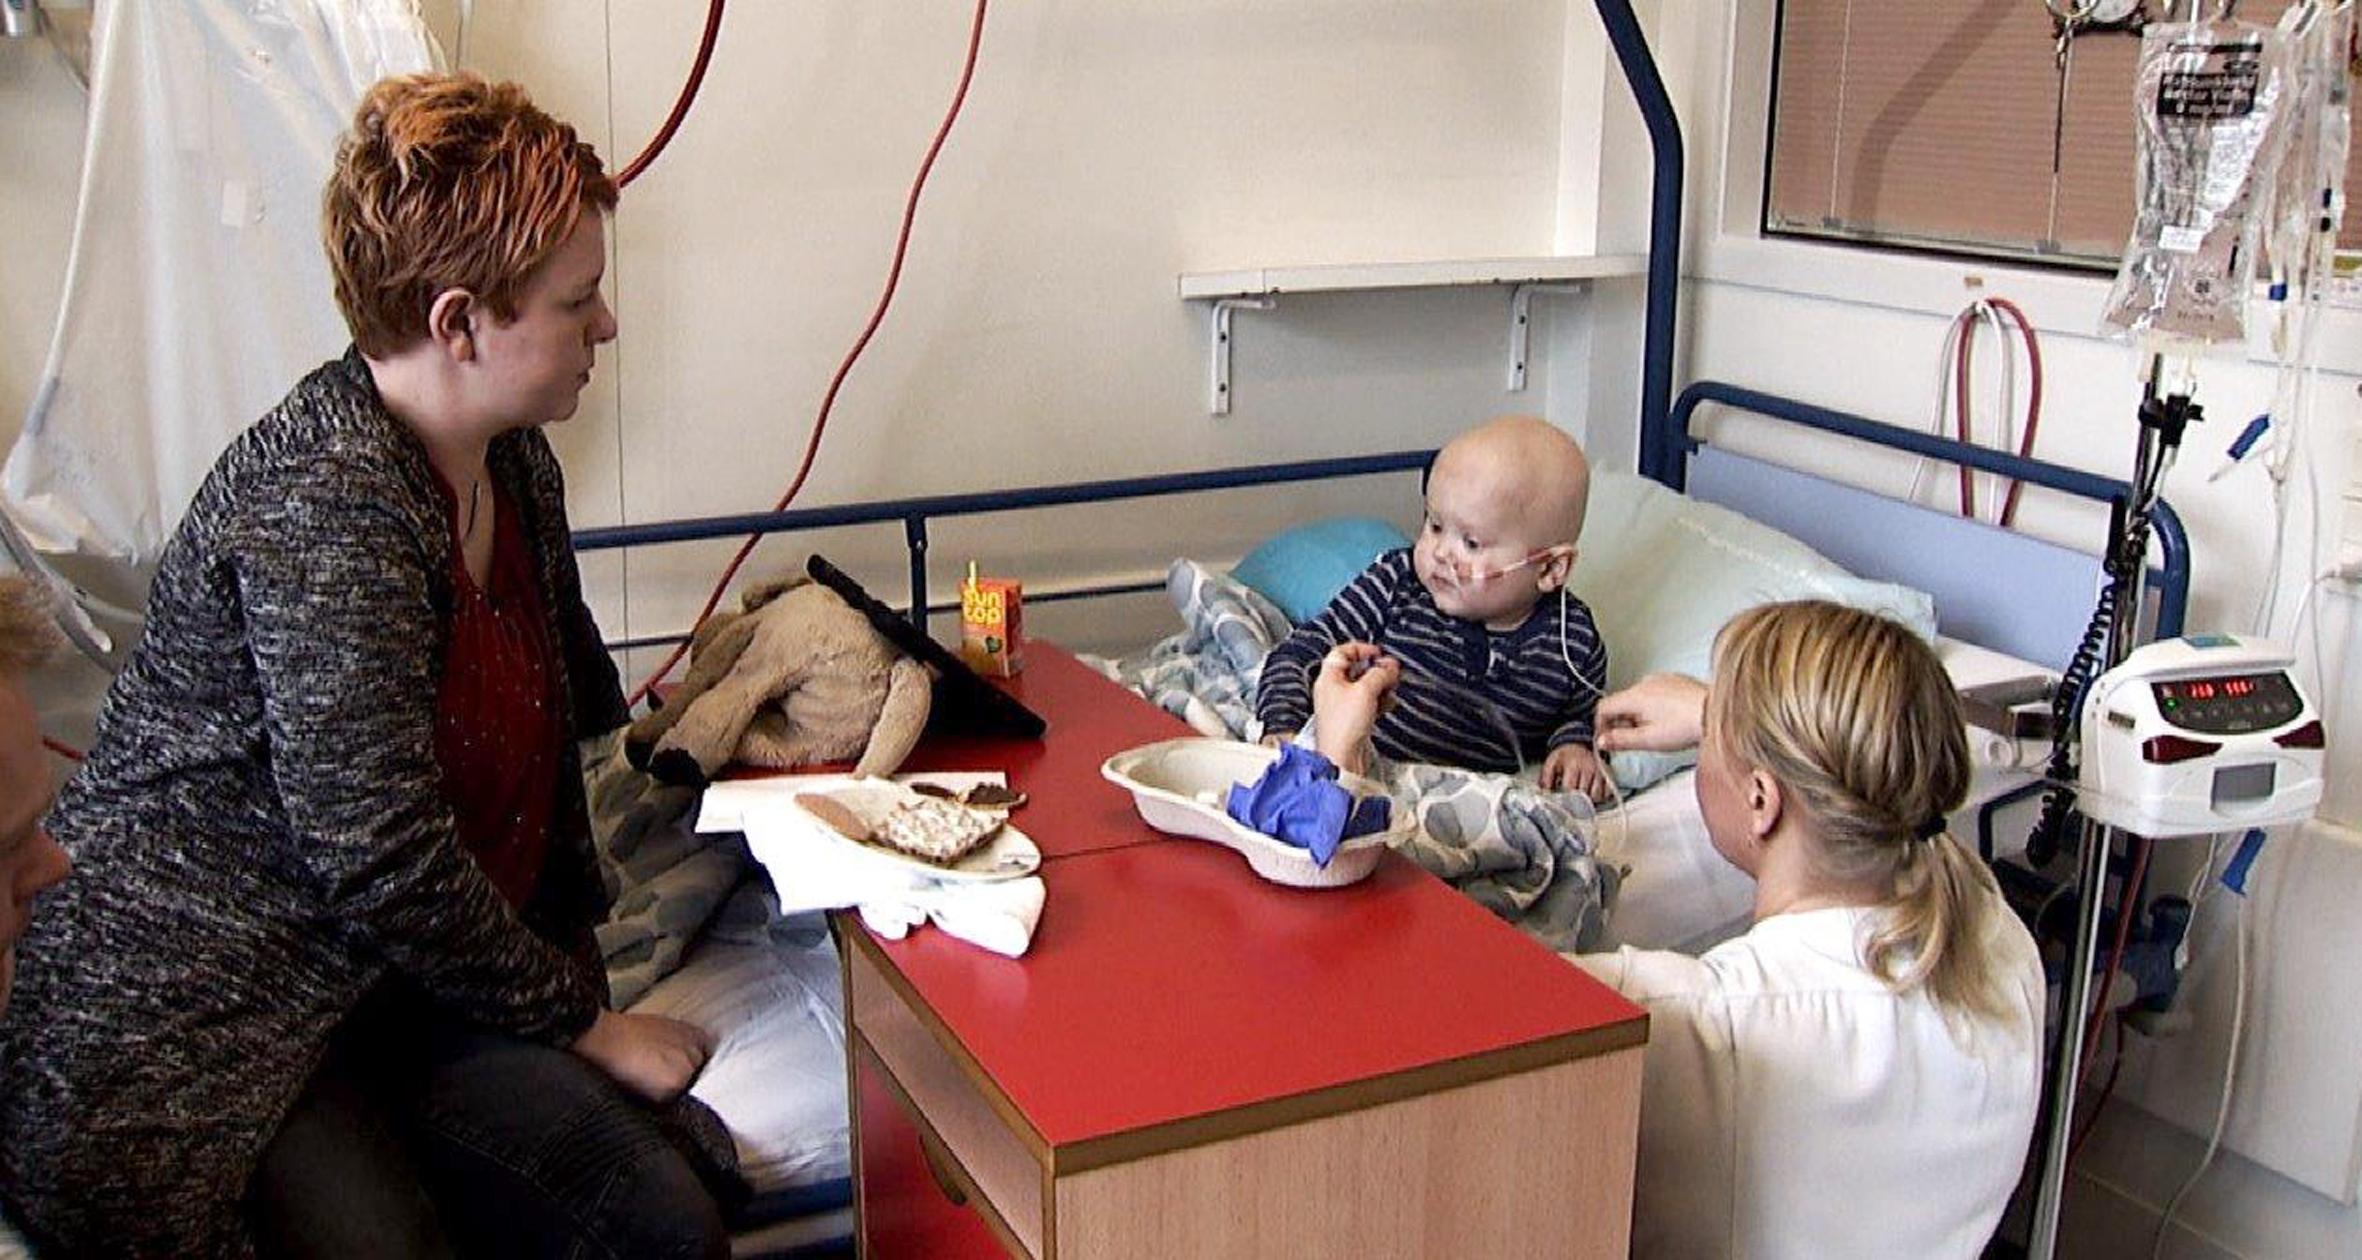 Christian Østergaard kræft børn